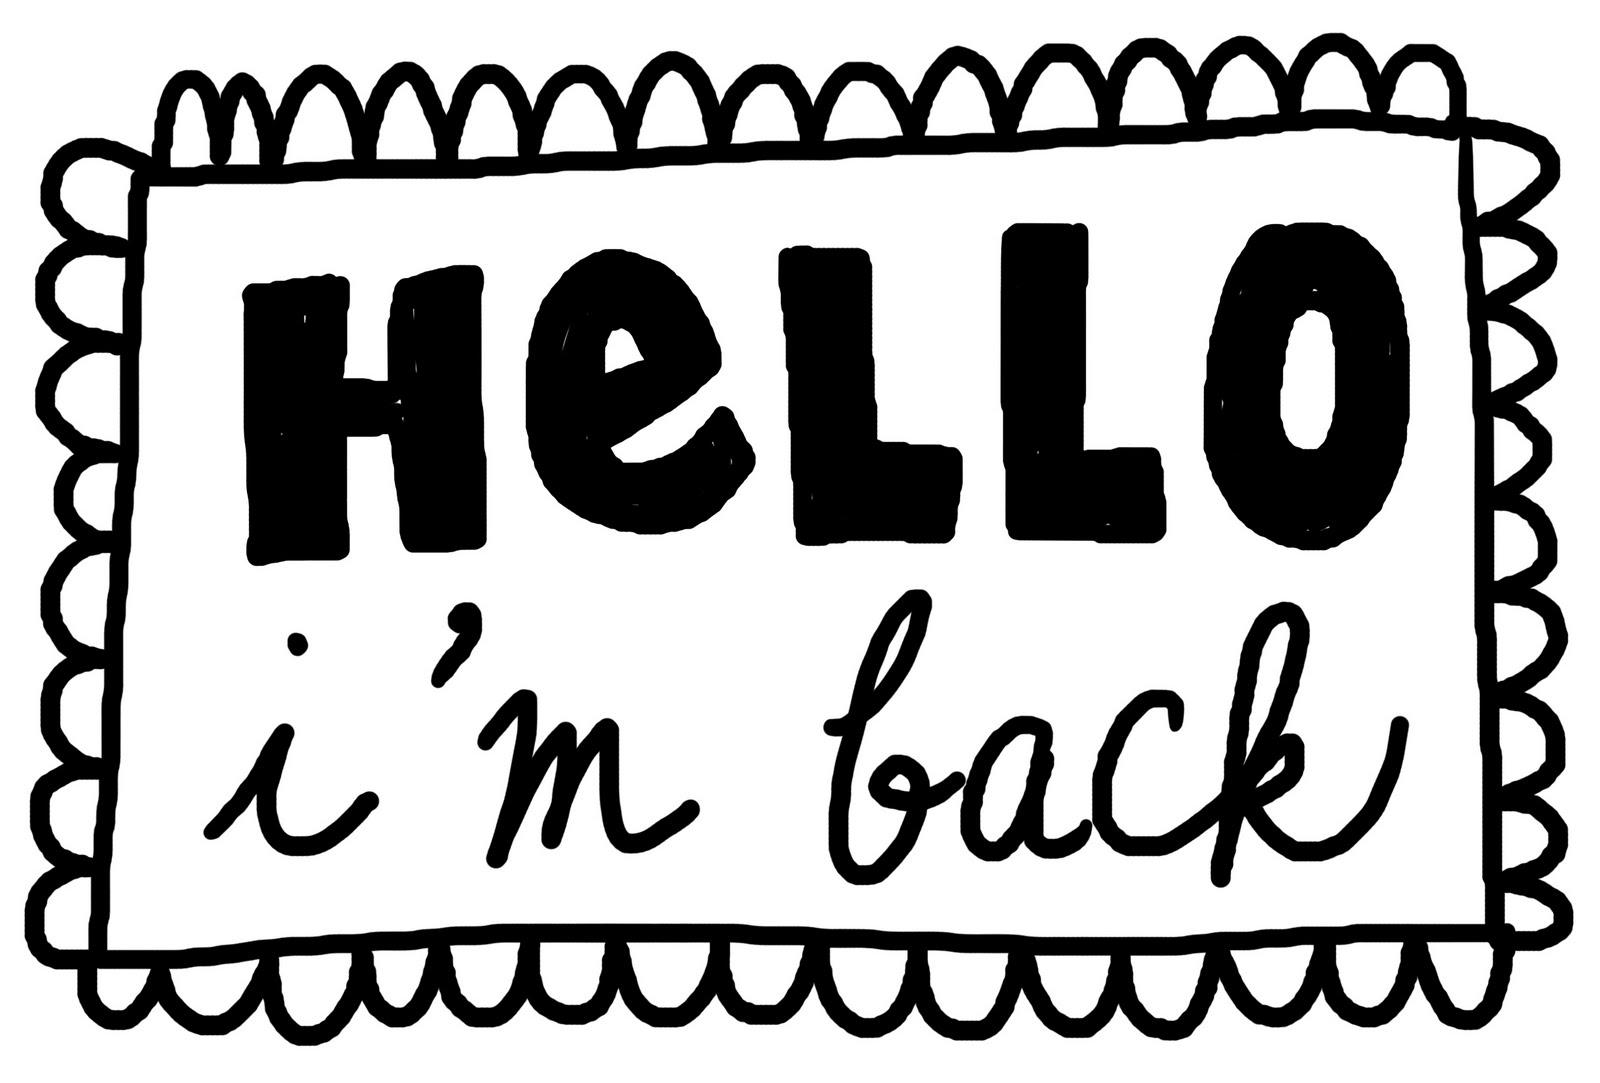 I M Back To Work Quotes Quotesgram. Nice Laptop Stickers. Sakura Decals. World Wide Web Logo. Duke 200 Decals. Panda Logo. Academy Logo. Custom Sticker Store. Fabricated Lettering